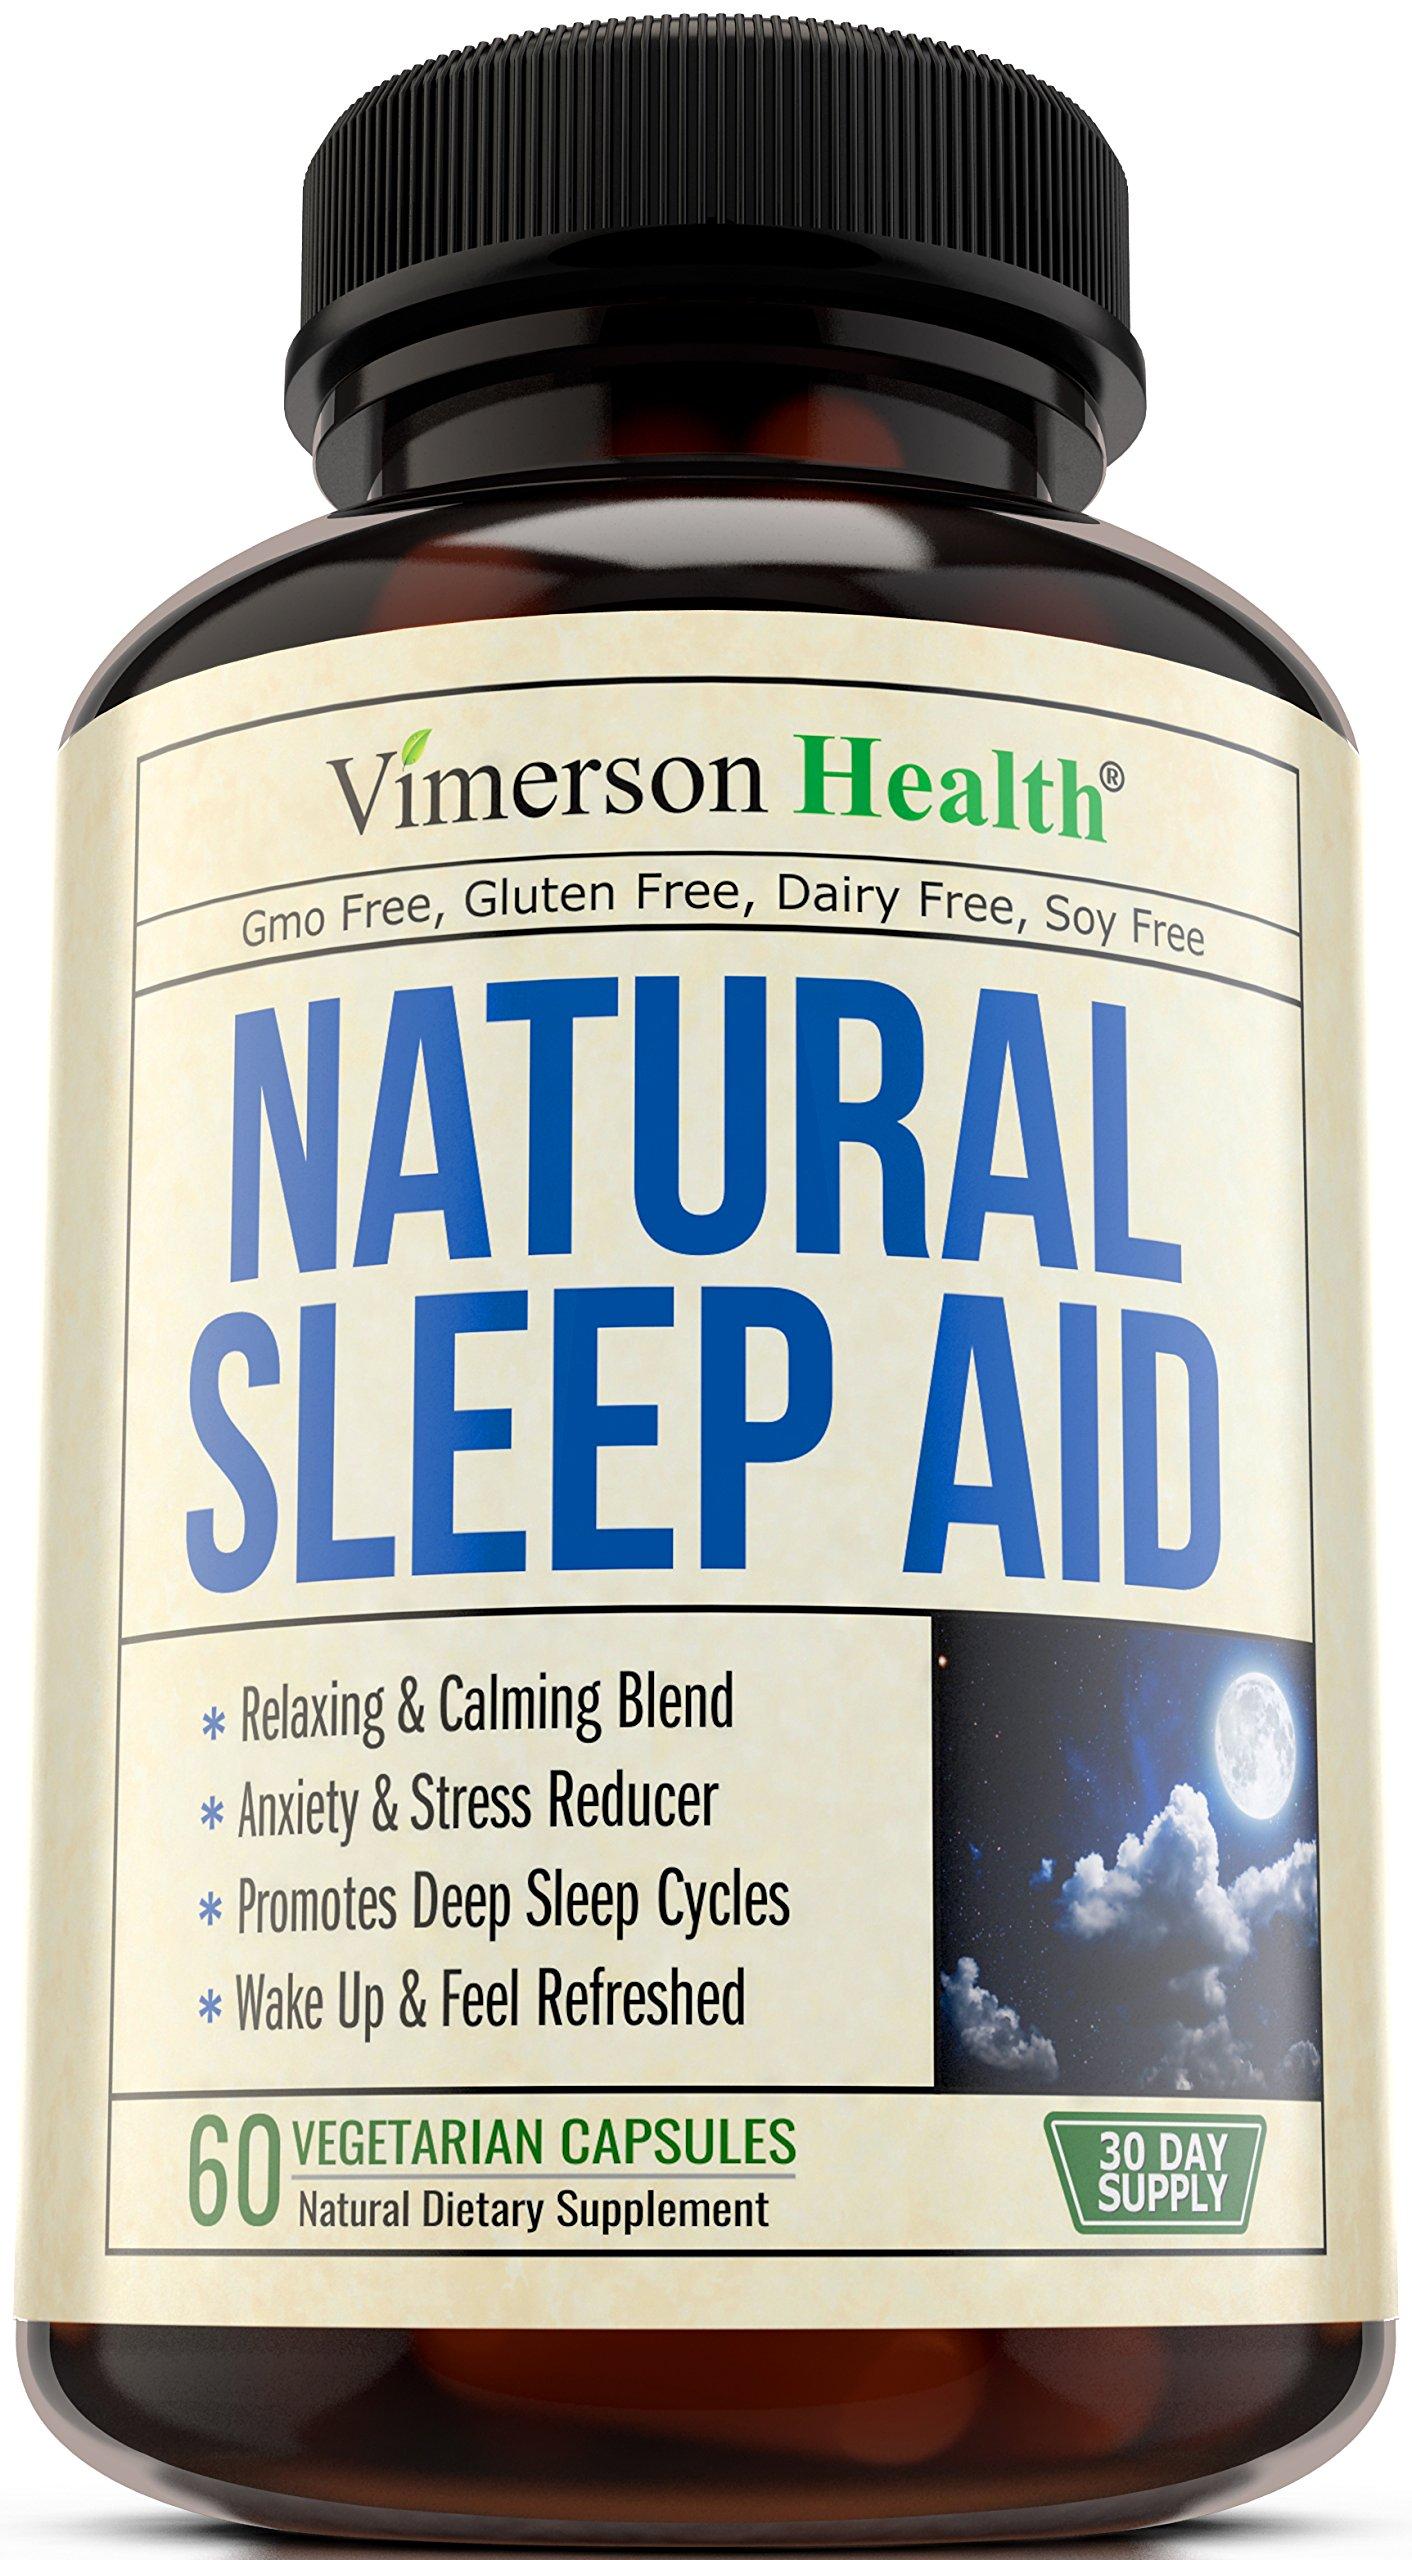 Natural Sleep Aid Pills - with Valerian, Melatonine & Natural Herbs - Premium Quality Sleeping Supplement with Chamomile, Vitamin B6, L-Tryptophan, Ashwagandha, L-Taurine, St. John's Wort, L-Theanine